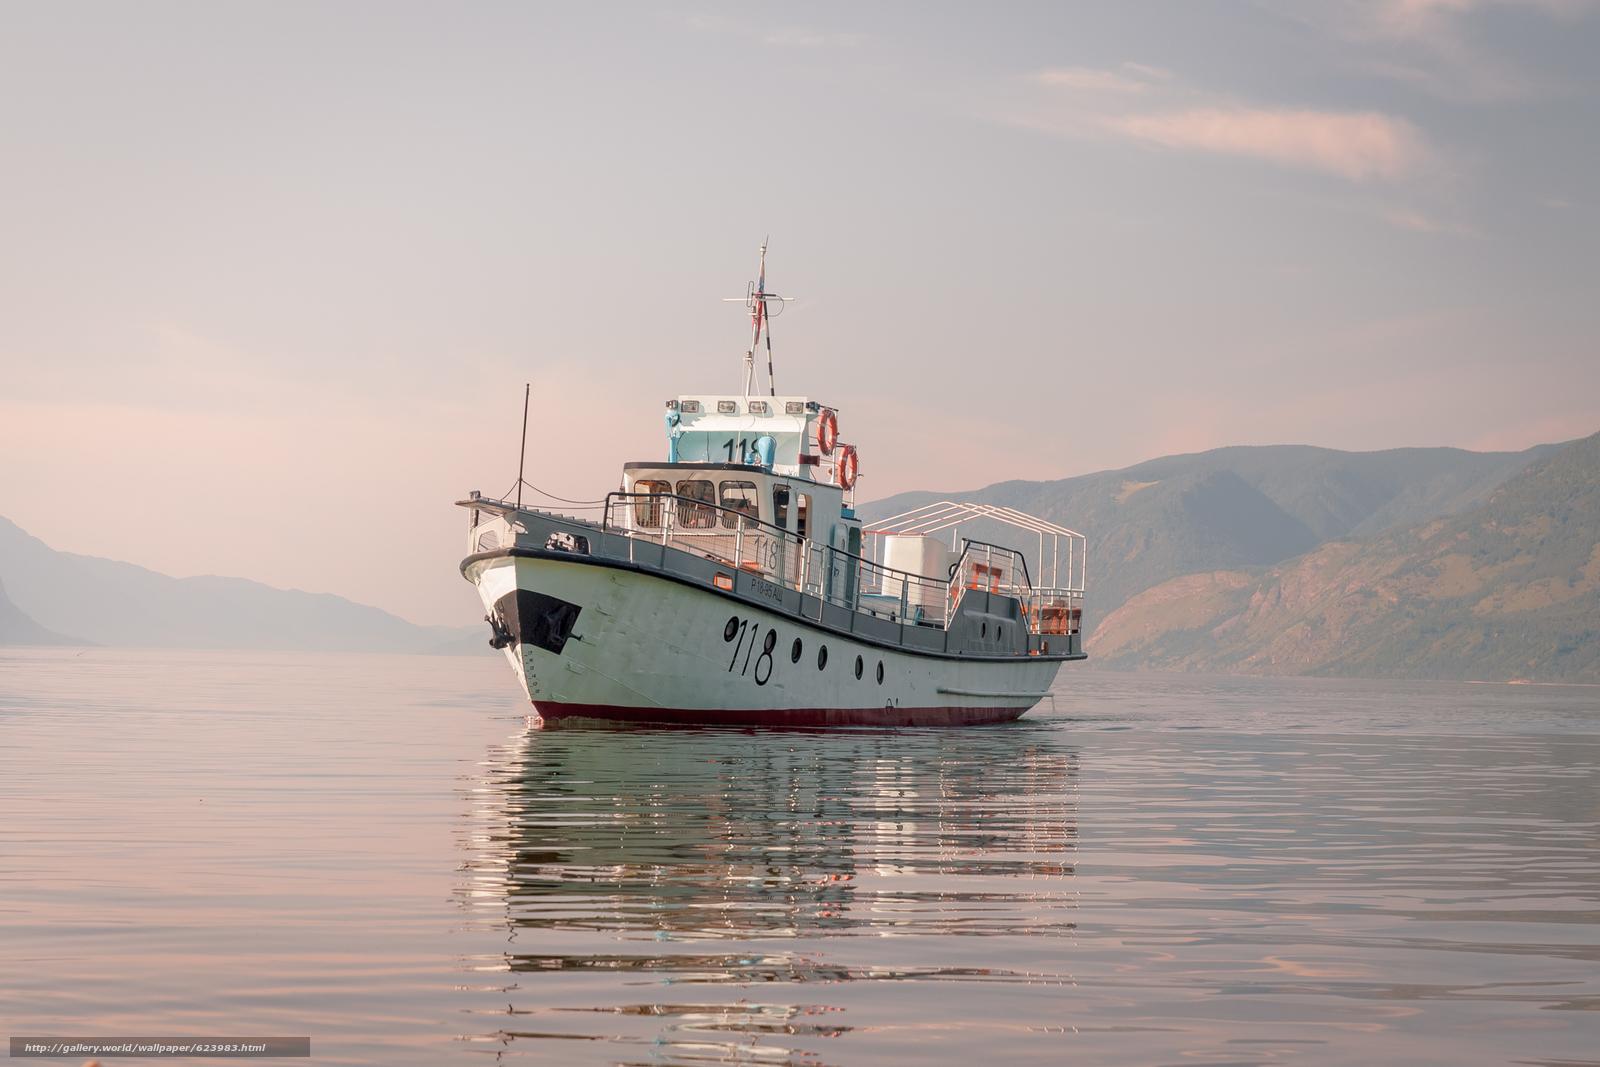 Descargar gratis BARCO,  Lago Teletskoe,  Altai,  Rusia Fondos de escritorio en la resolucin 2145x1430 — imagen №623983